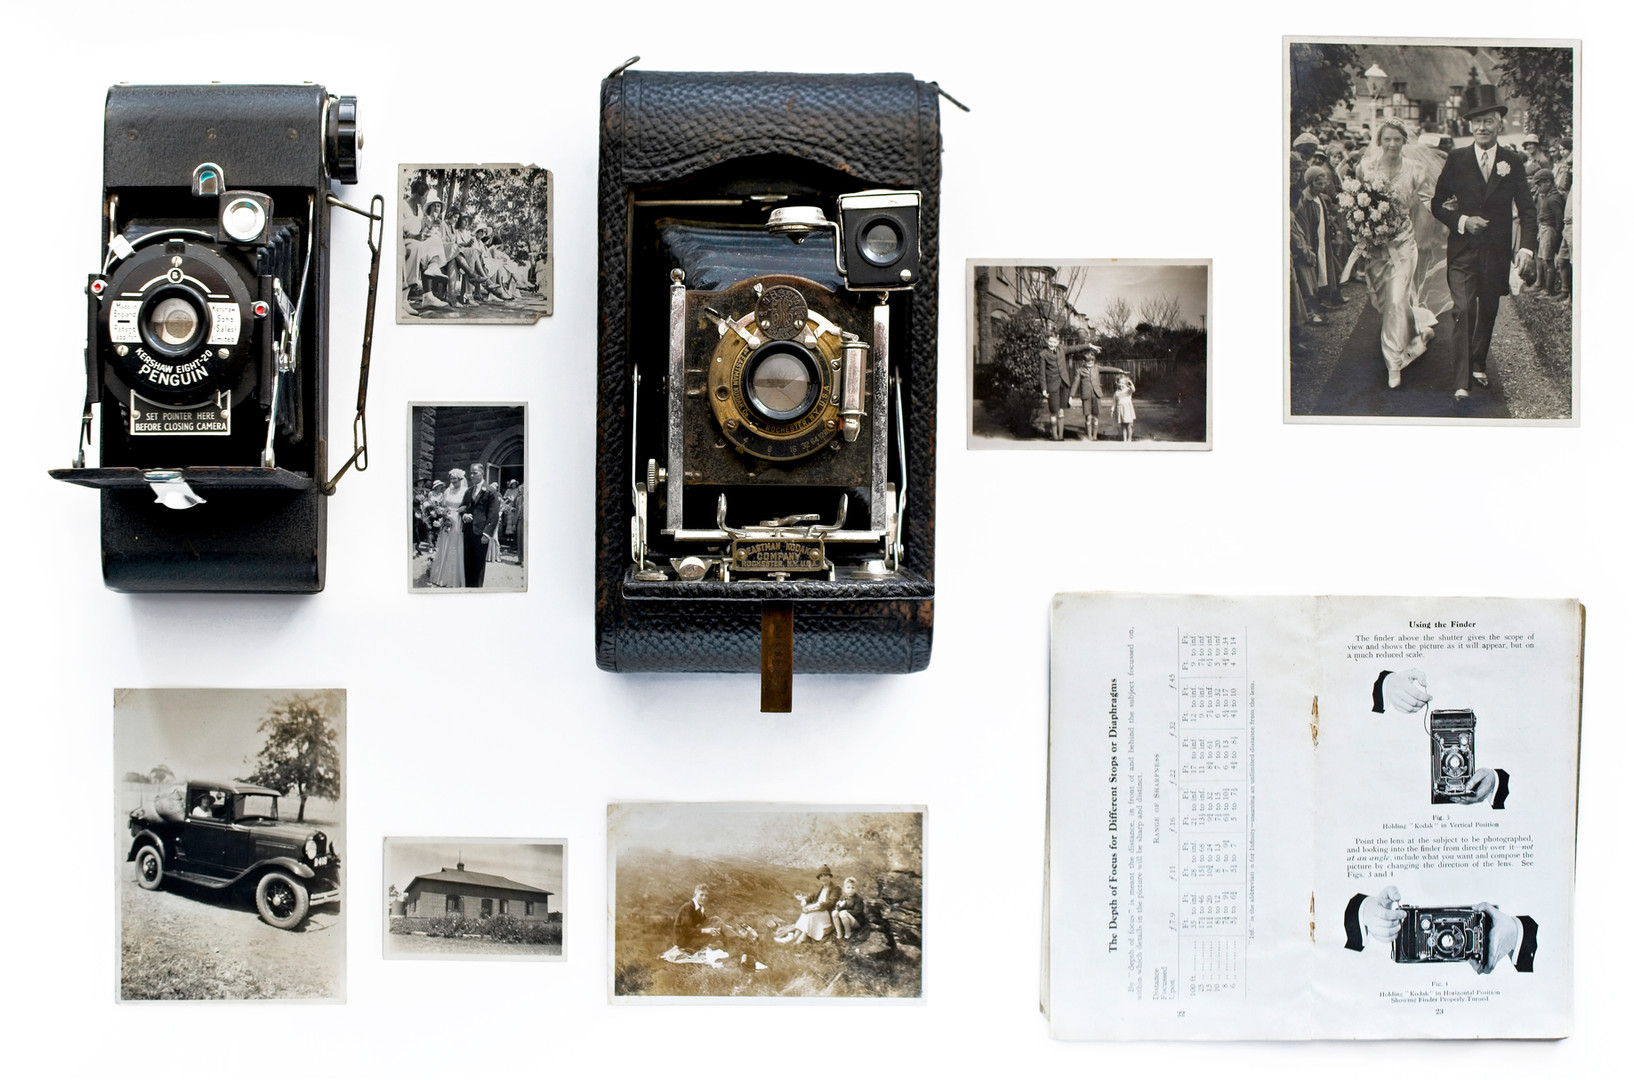 Old Cameras and originals 1